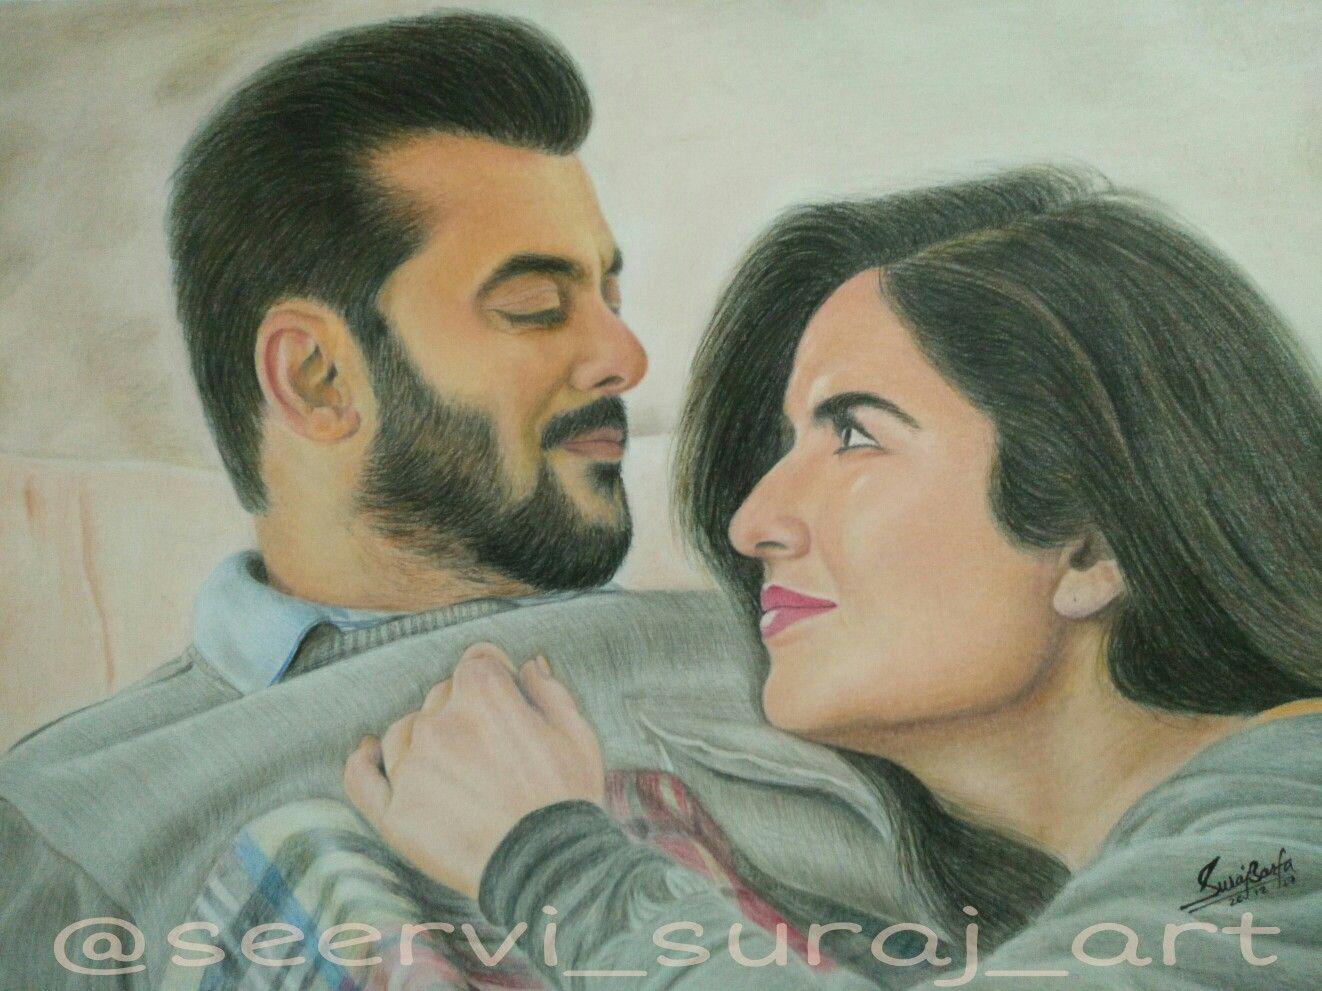 Salman khan and katrina kaif from tiger zinda hai sketch by me ig seervi suraj art fb sb art salmankhan katrinakaif